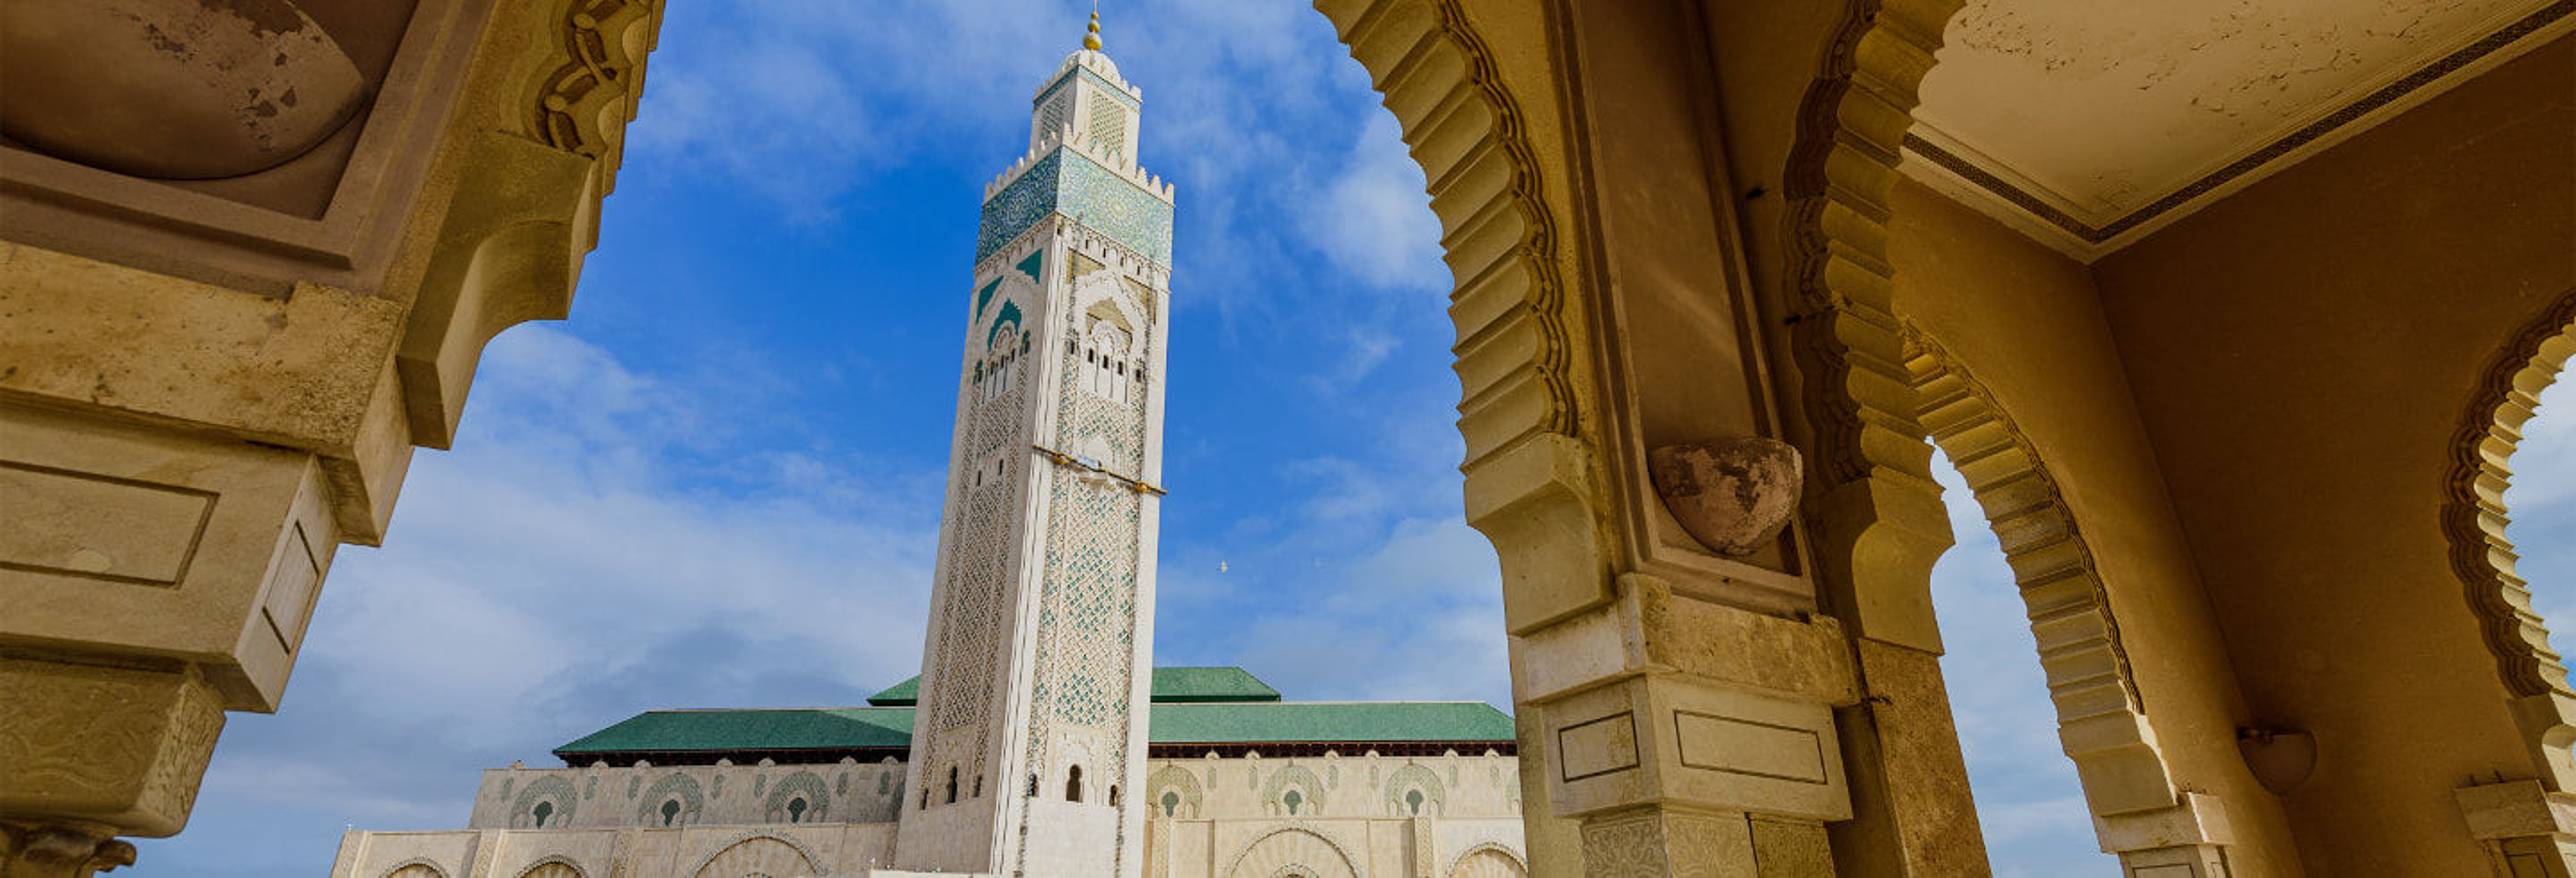 Tour privado por Casablanca con guía en español